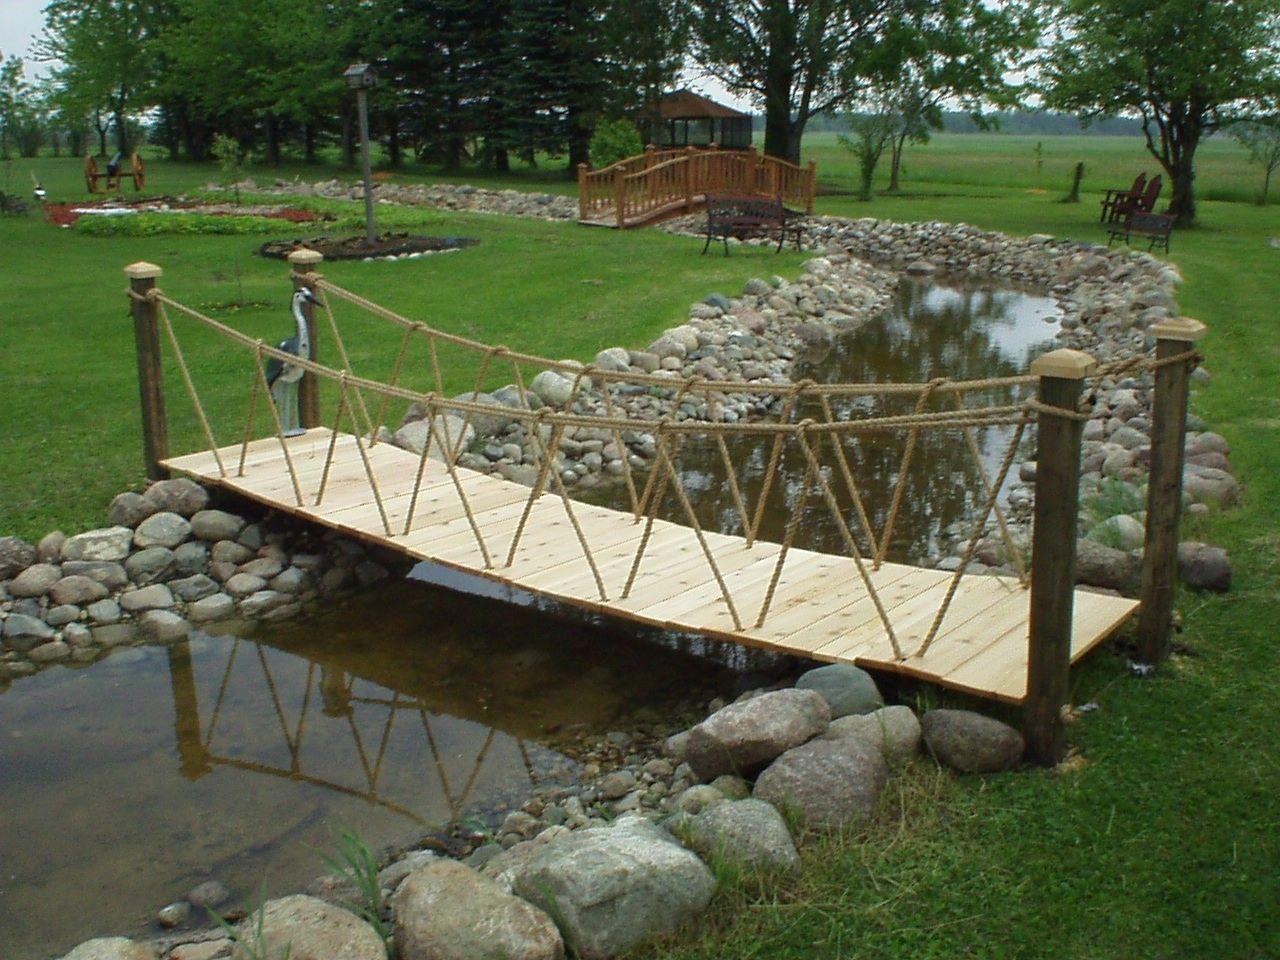 Backyard Bridge Designs 25 amazing garden bridge design ideas that will make your garden beautiful Bridges Rope Bridges 3x14ft 1975 00 Rs 8 Garden Bridges